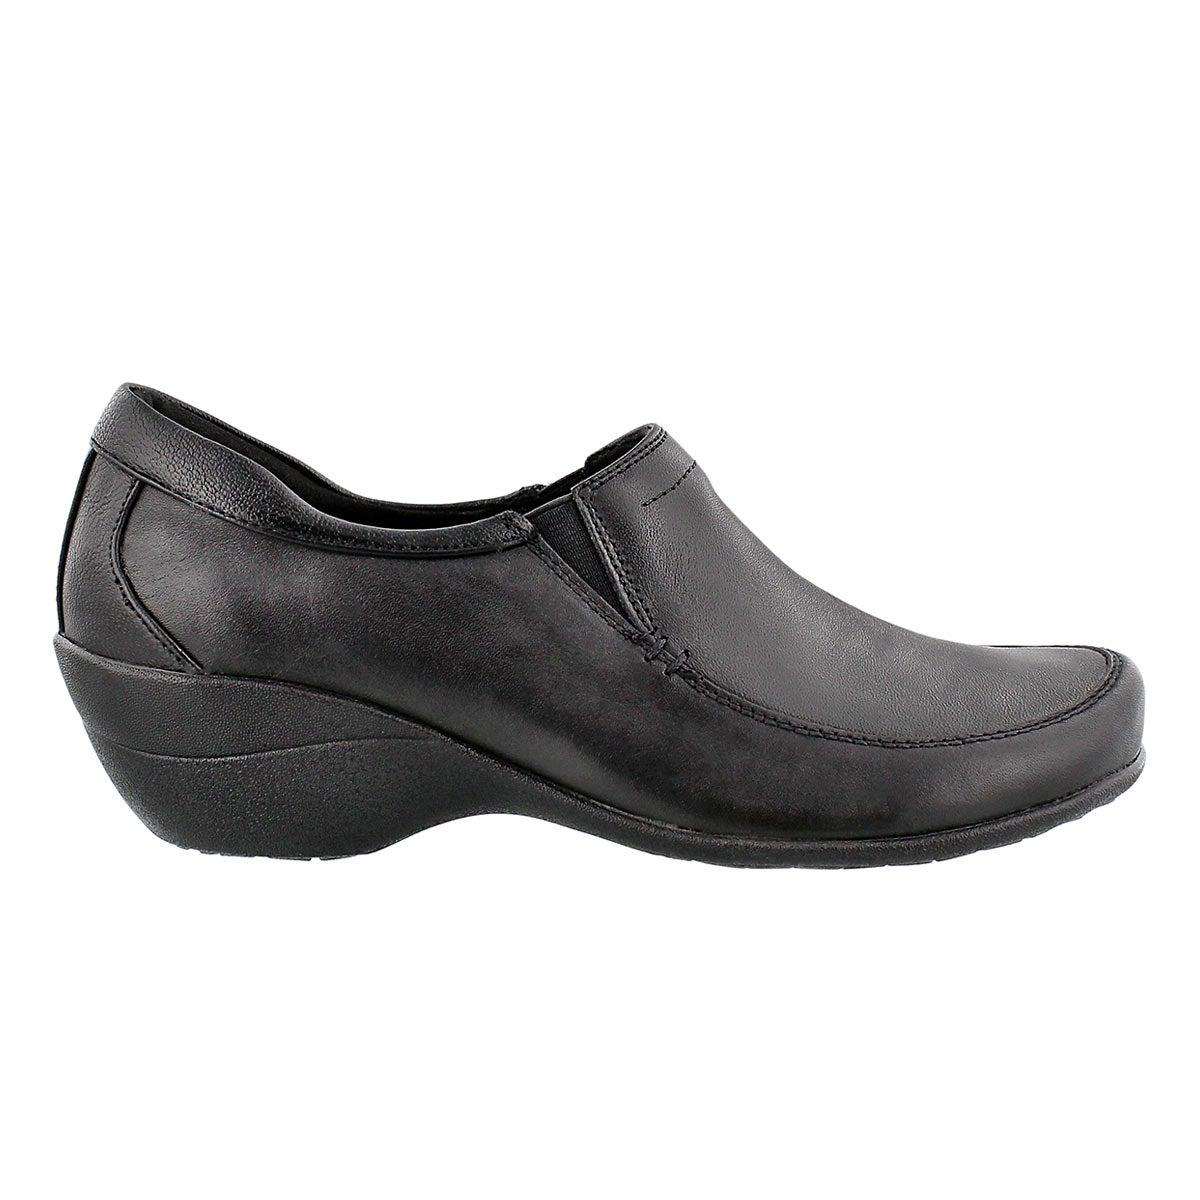 Lds Tabatha Kana Slip On blk  dress shoe